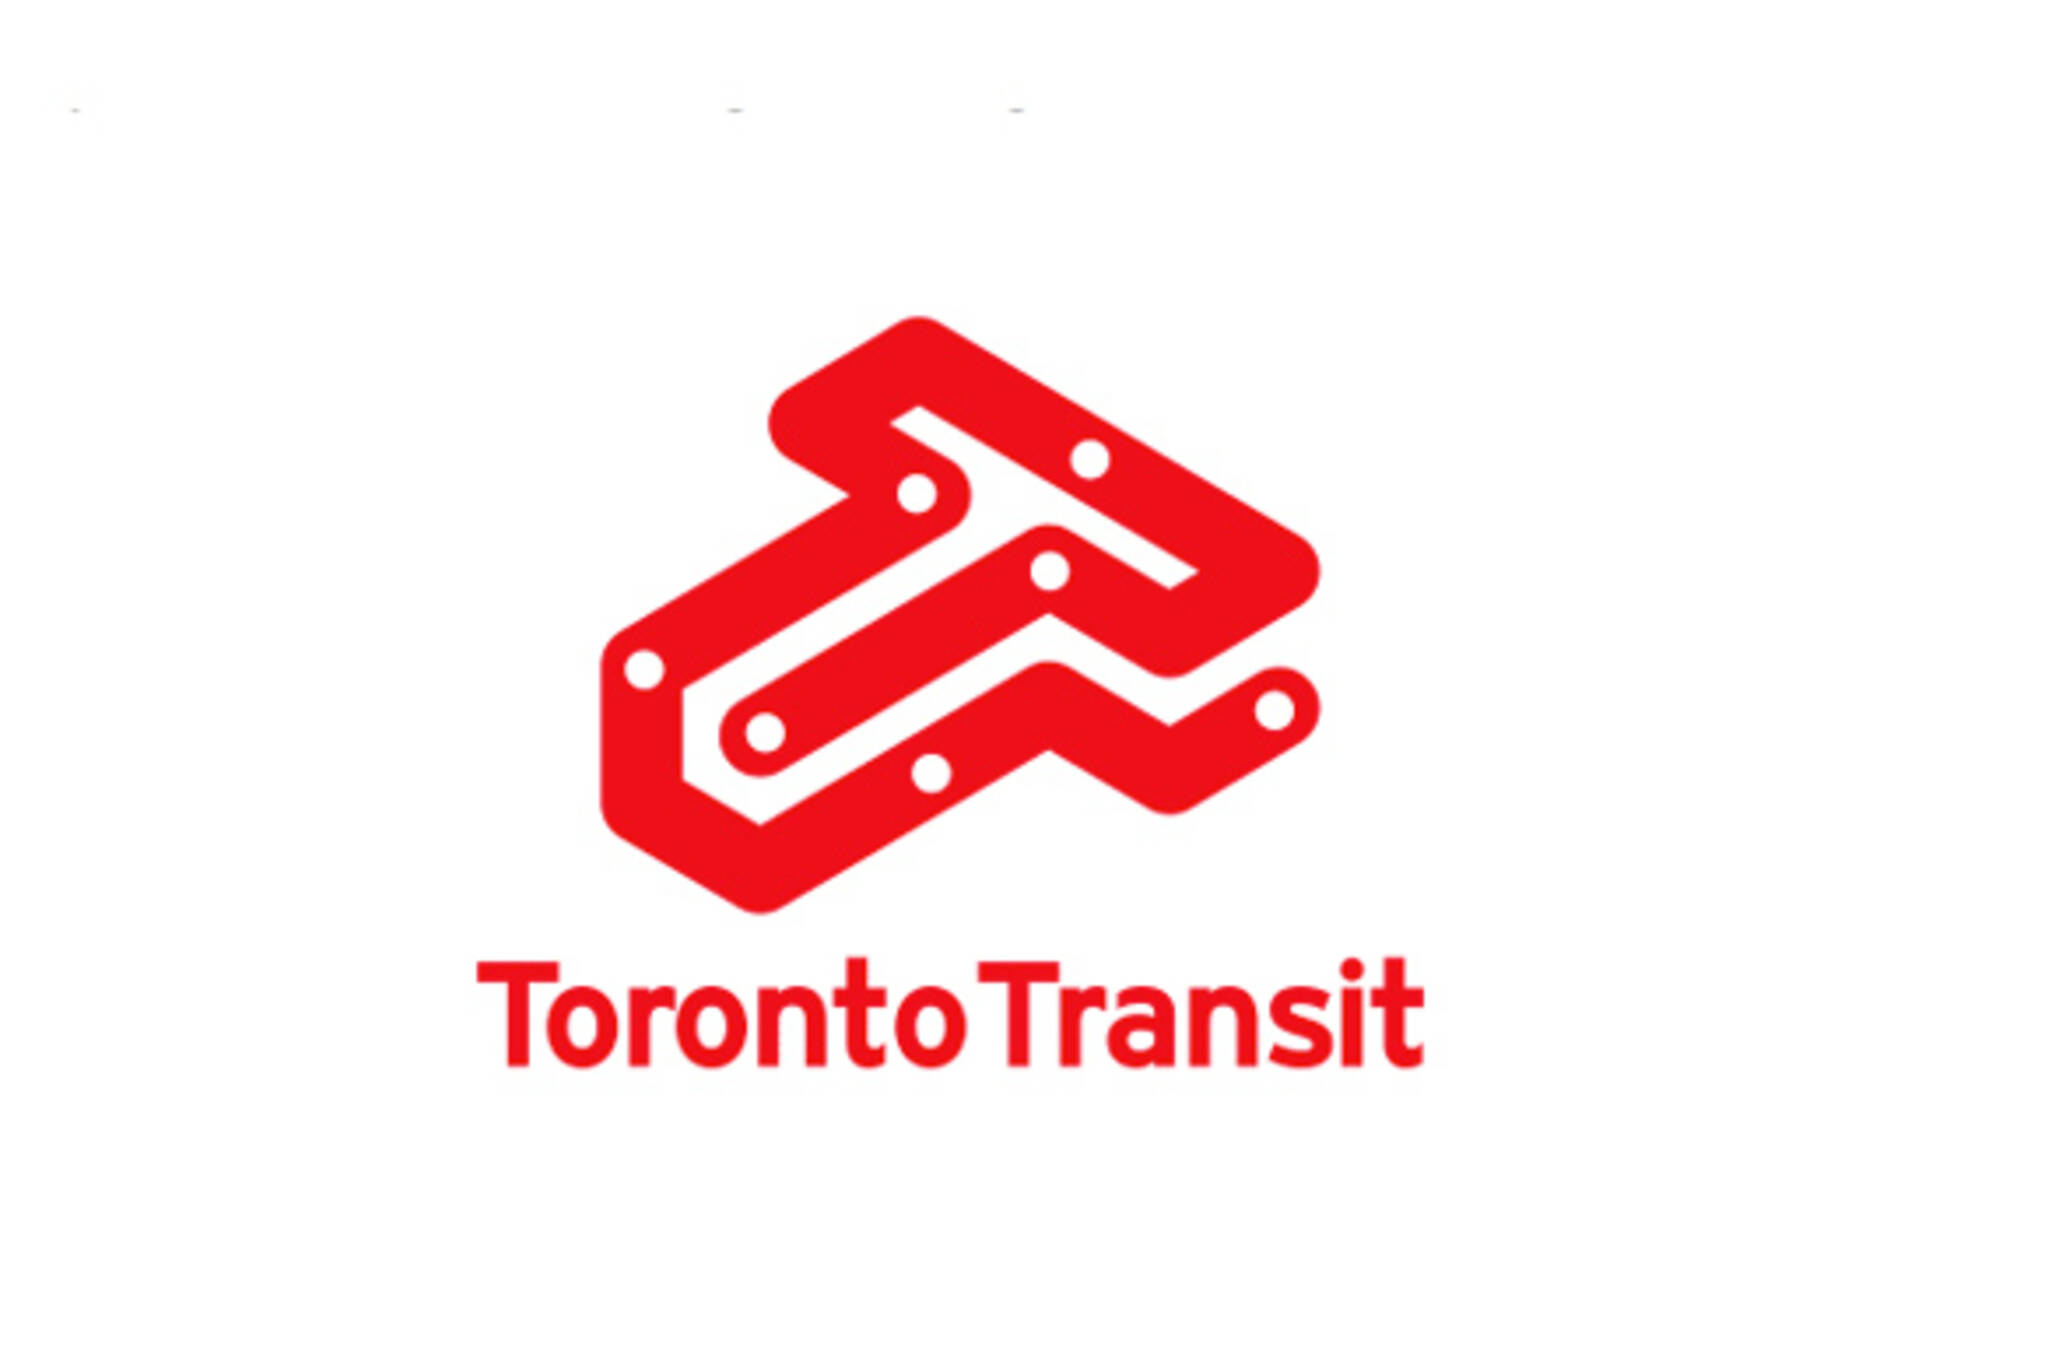 Rebrand TTC logo